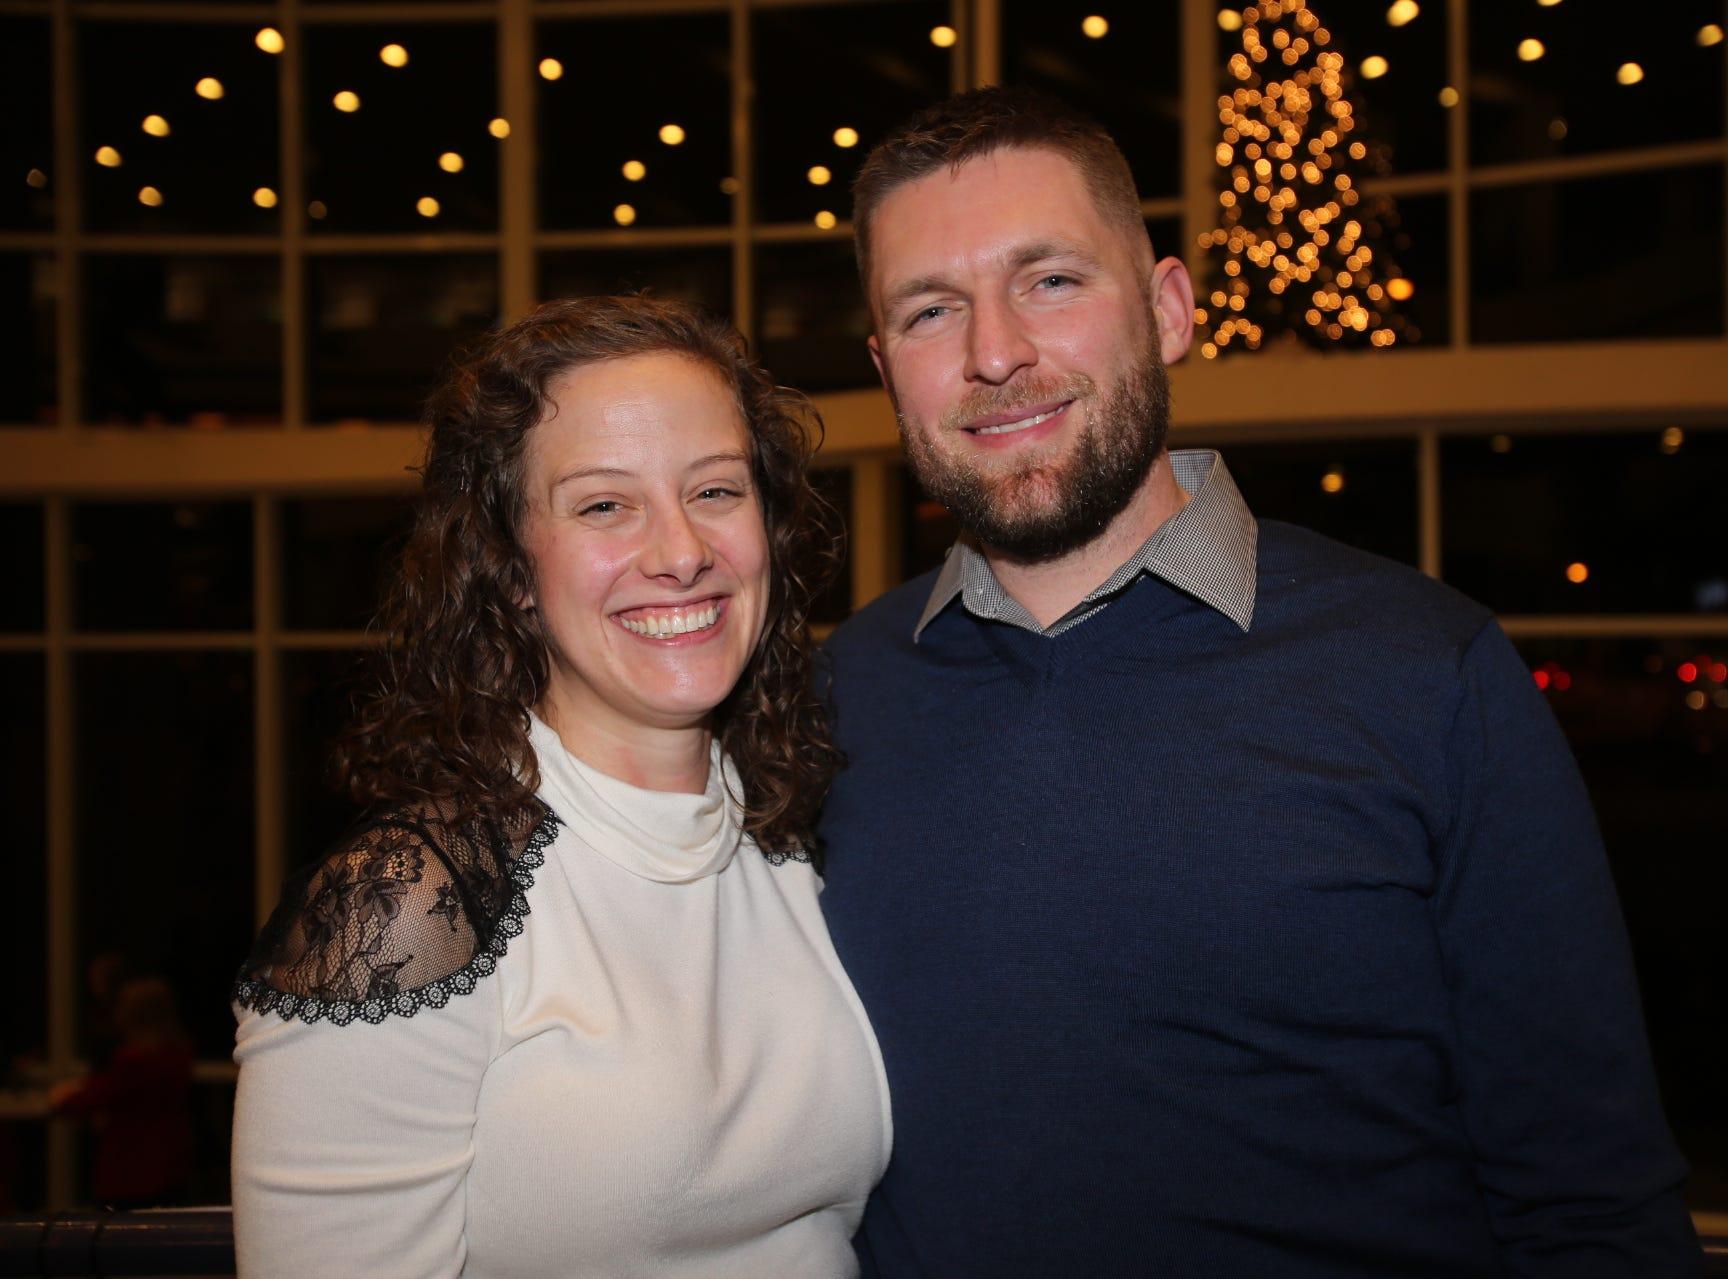 Rebecca and Joshua Braun